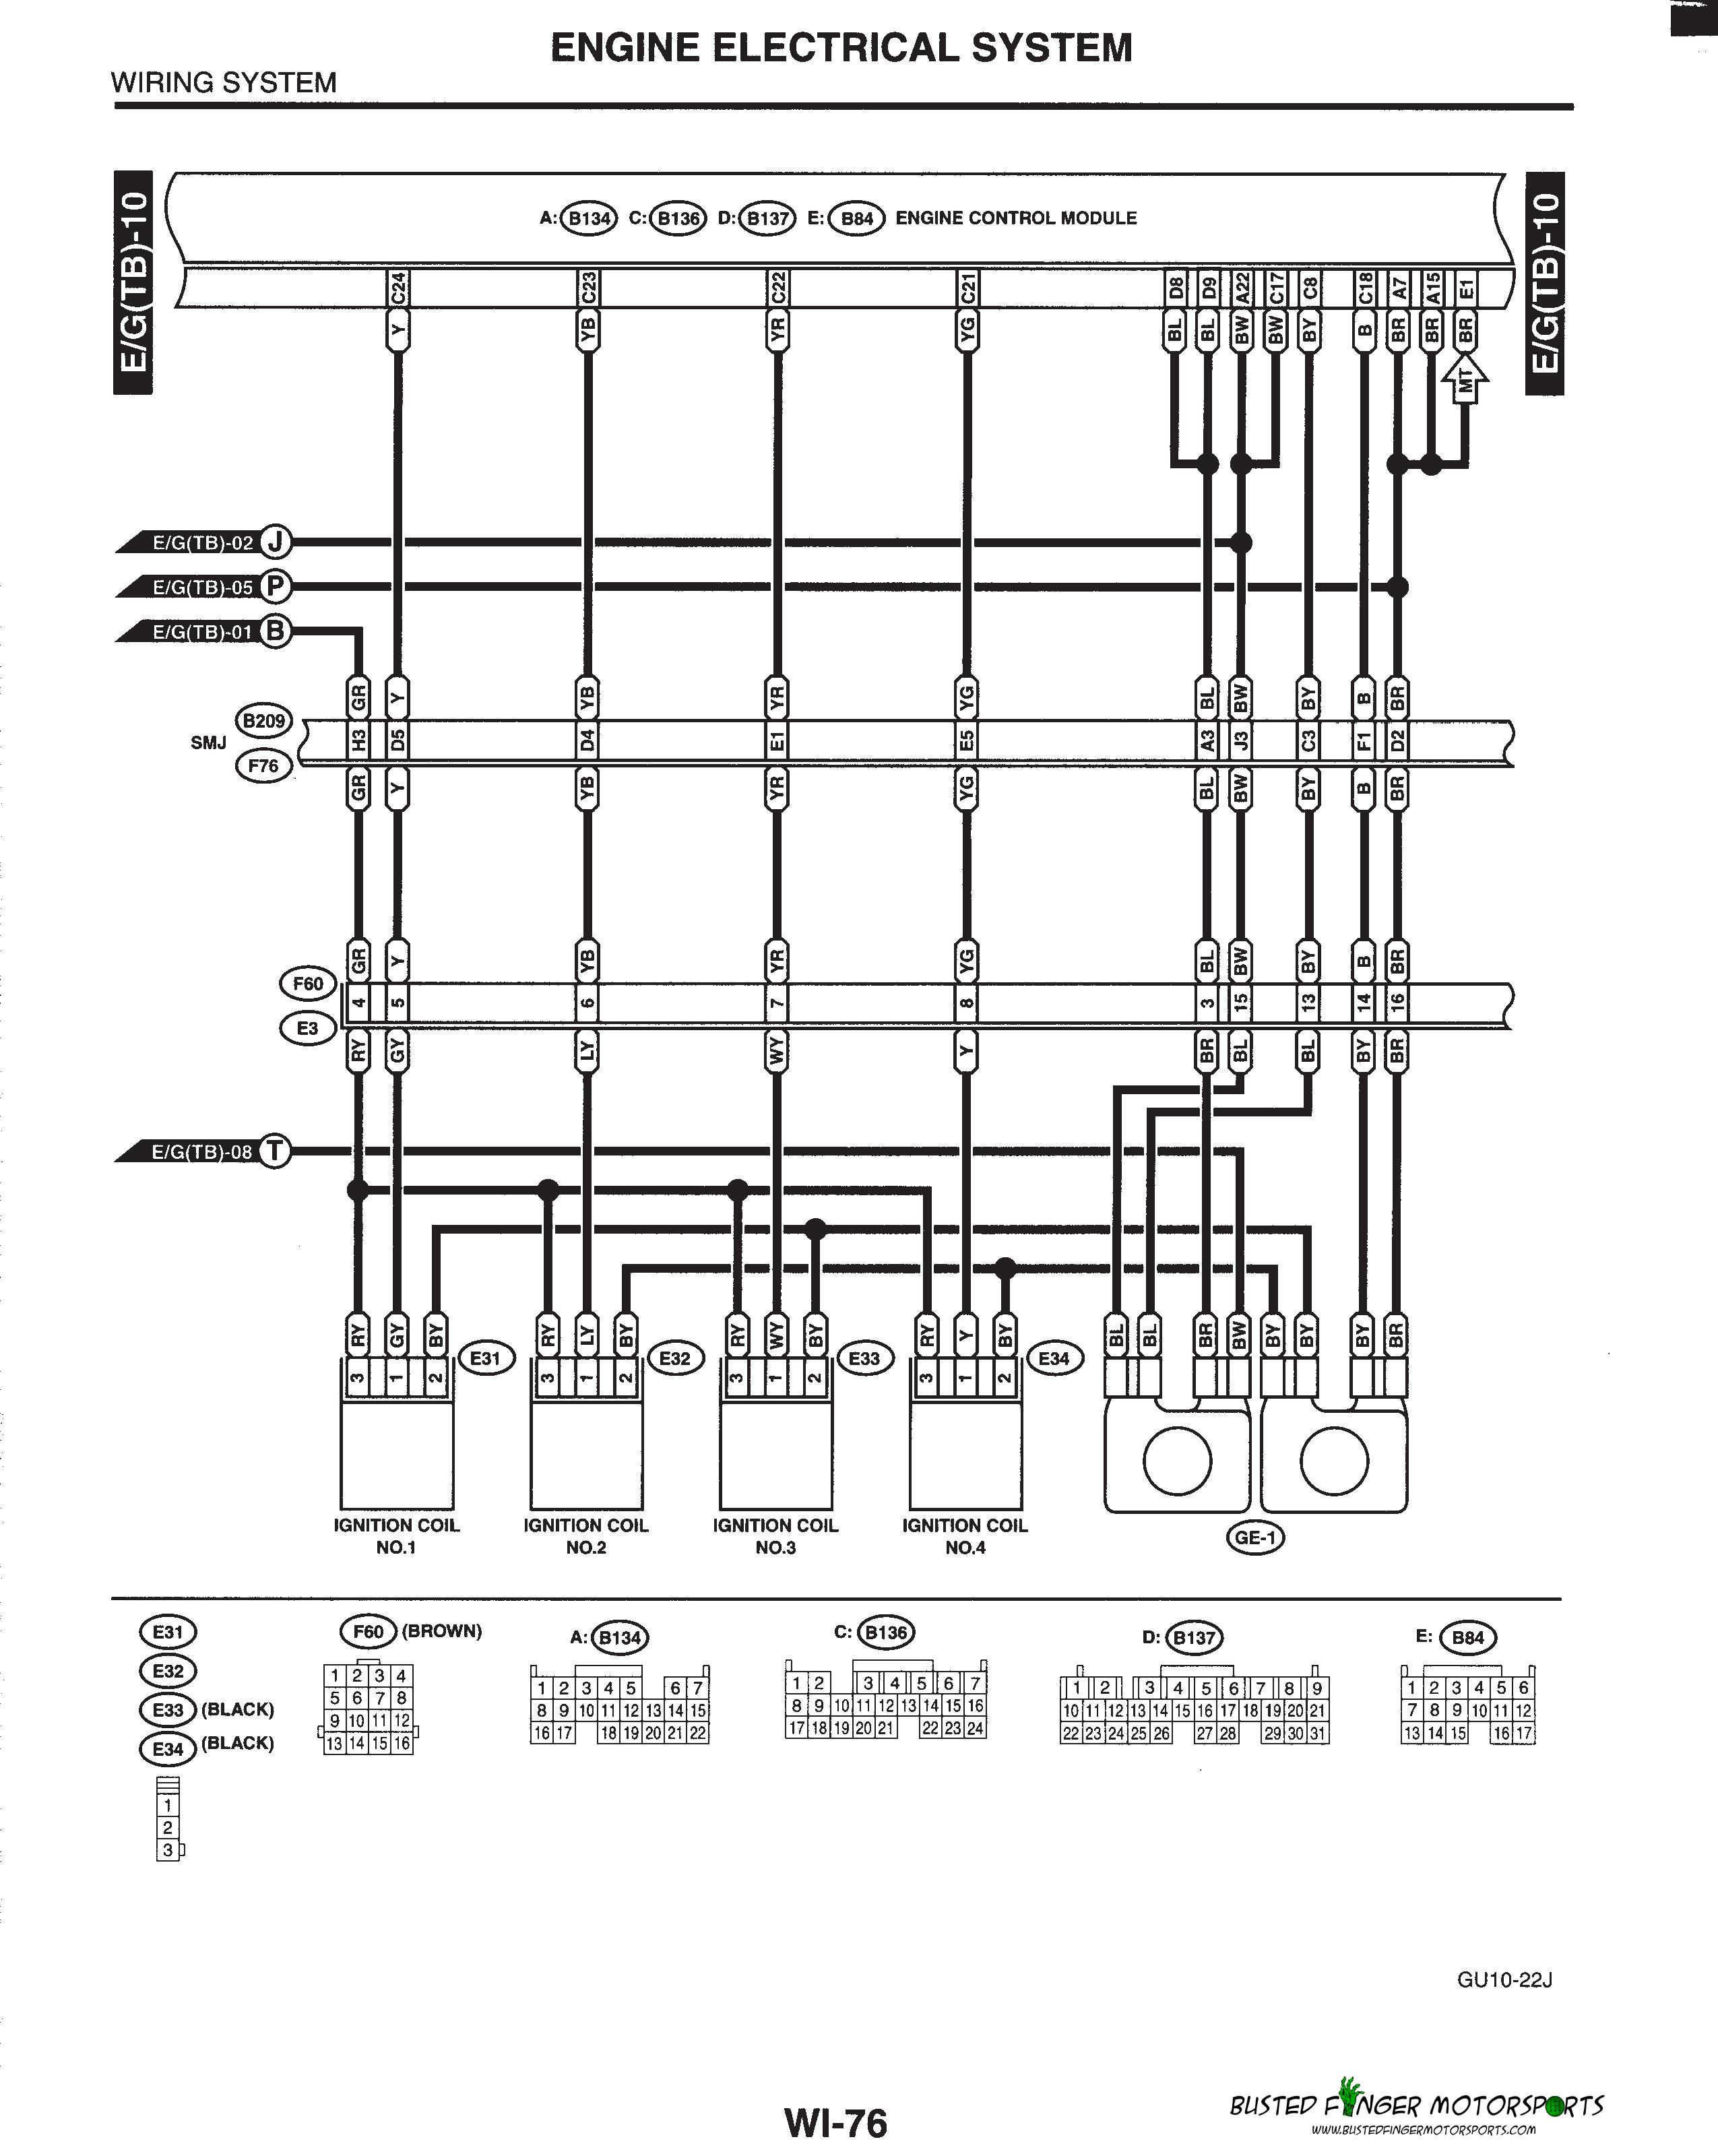 Busted Finger Motorsports 02 03 Bugeye Wrx Engine Schematics Diagram Turbos